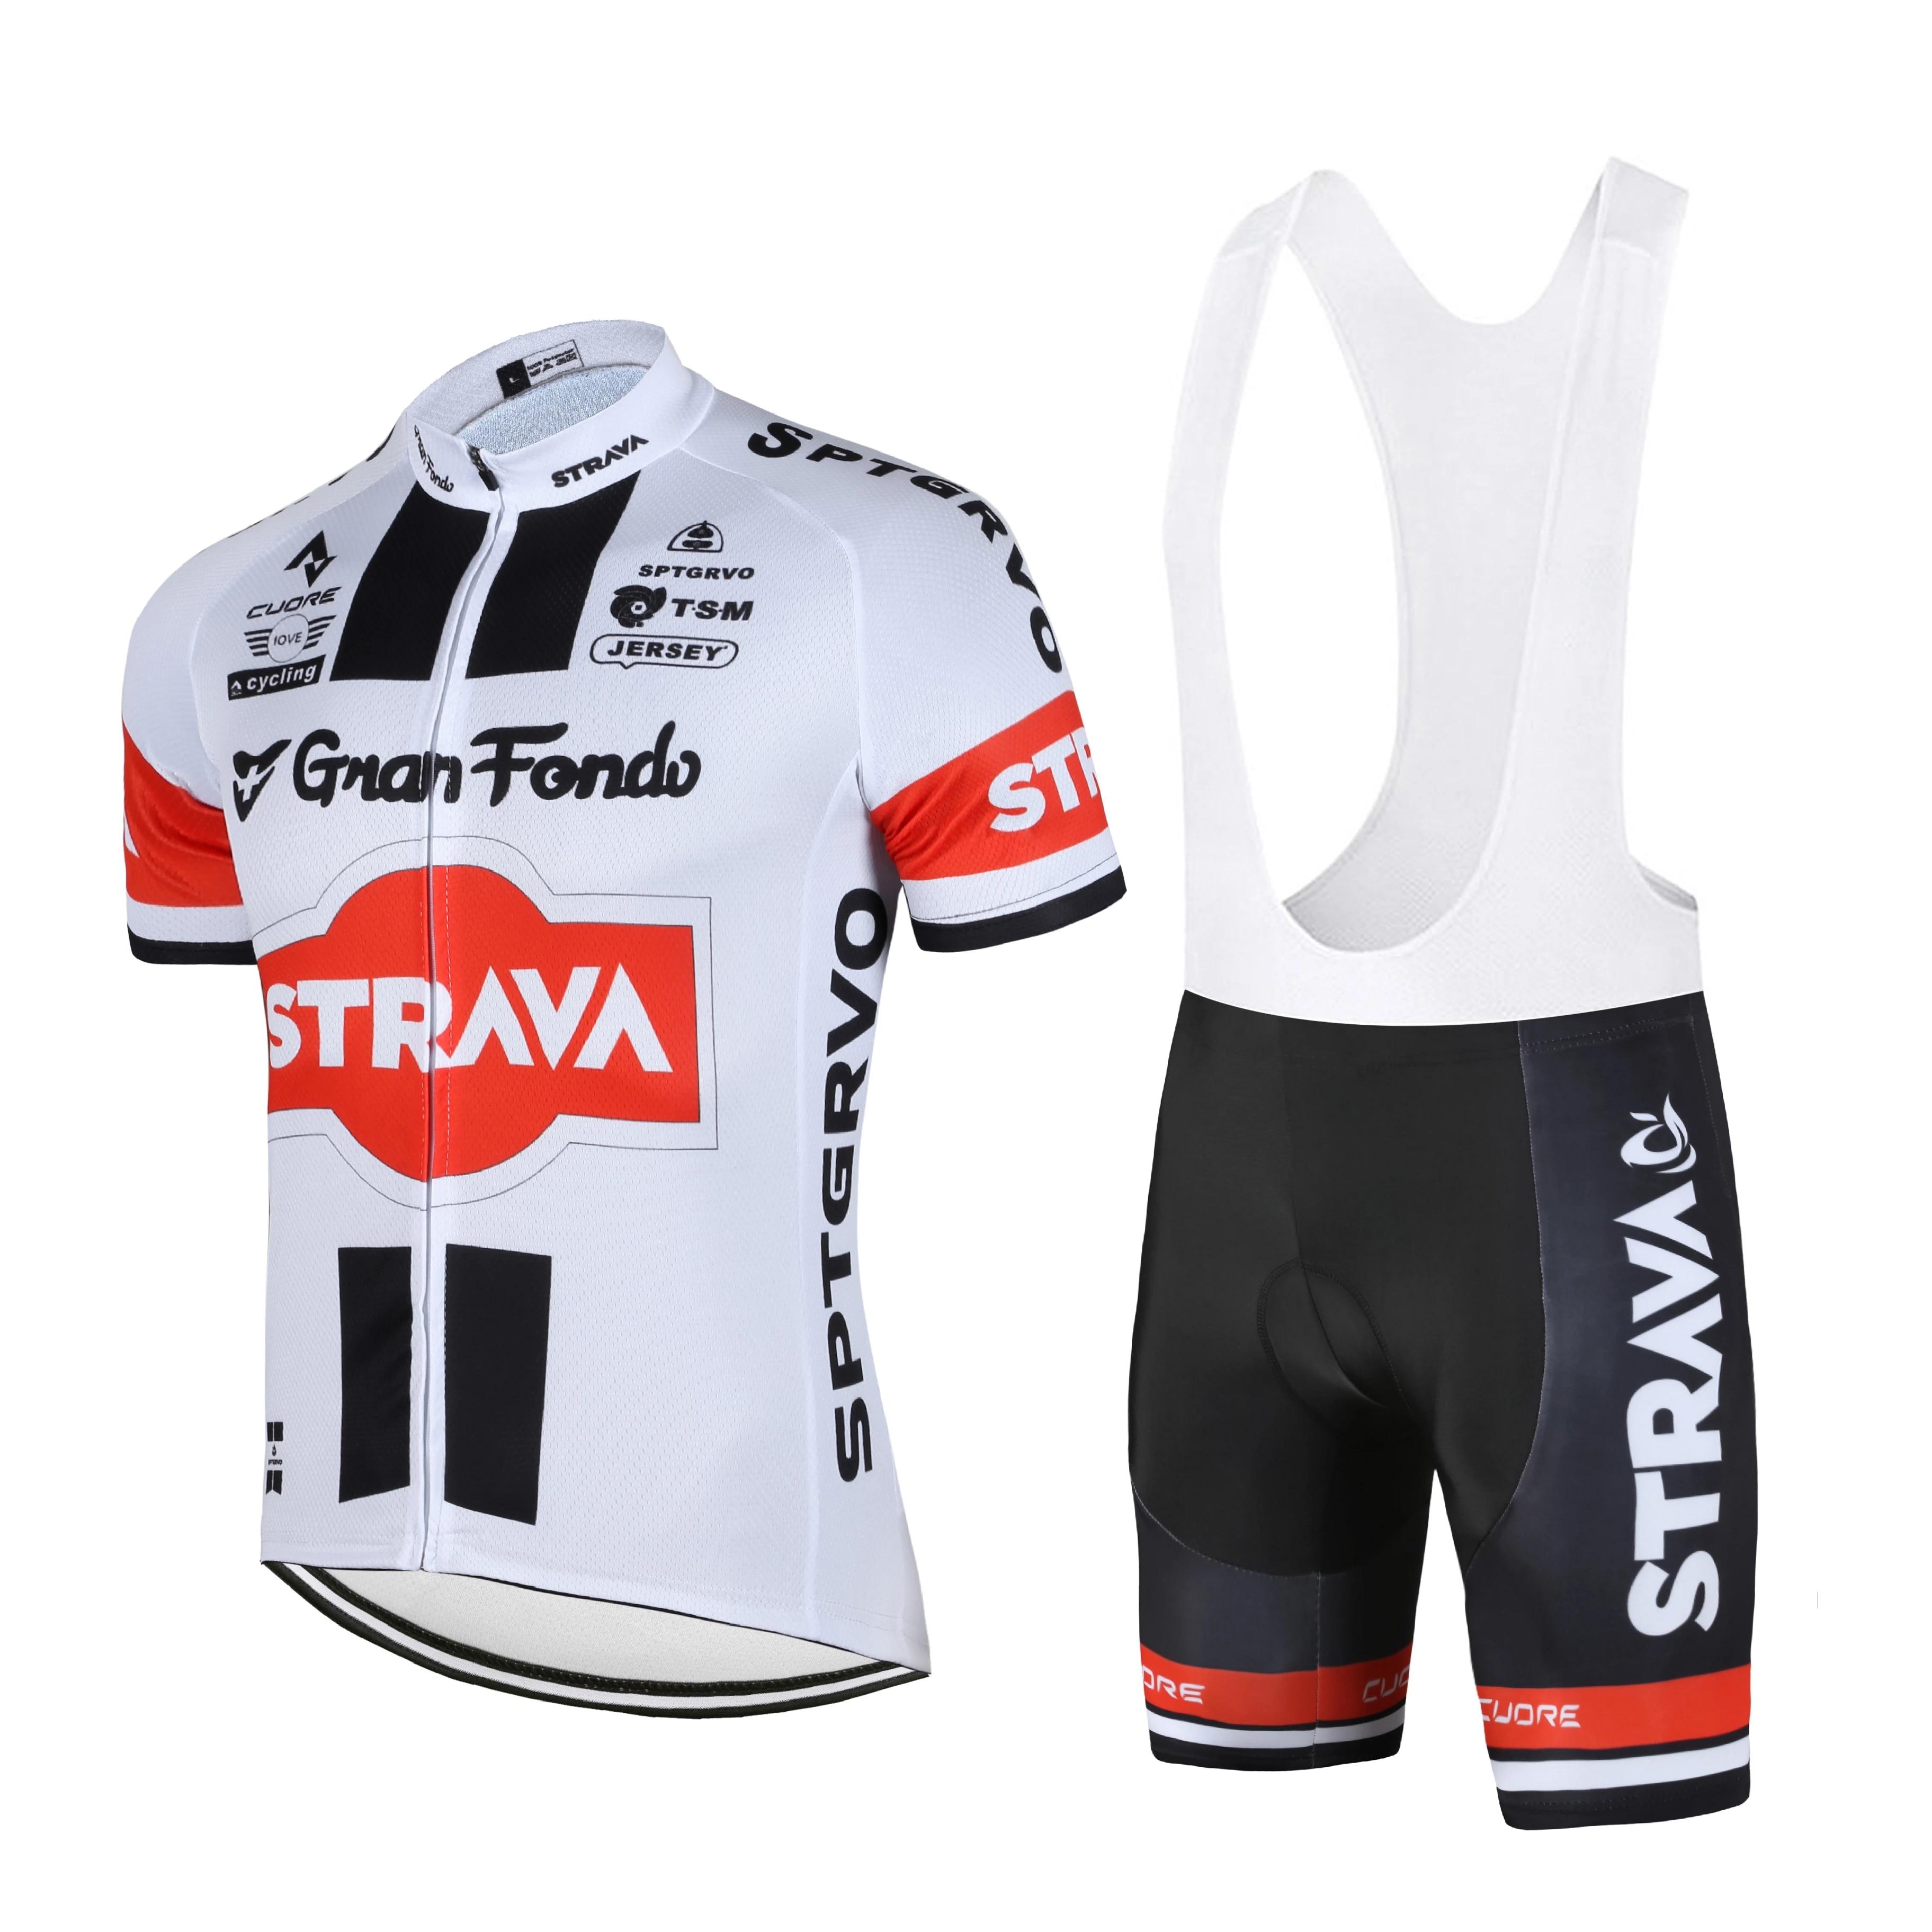 STRAVA-Conjunto de Ropa de Ciclismo de equipo profesional para hombre... Maillot de...